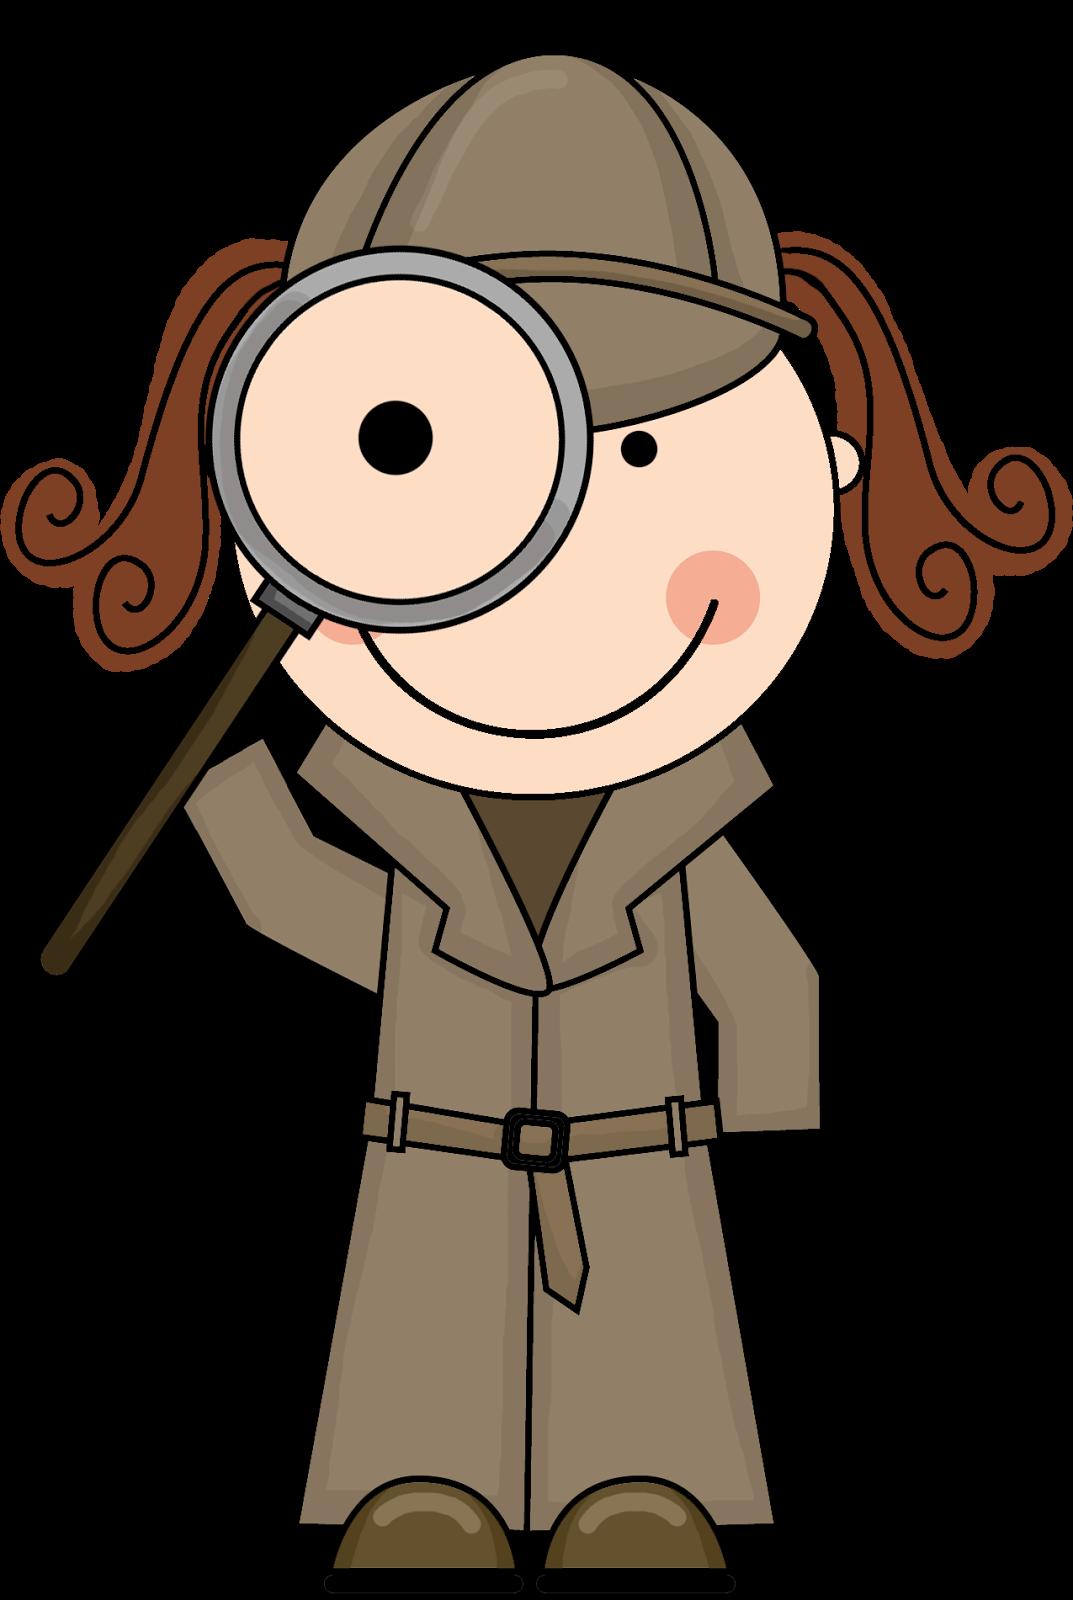 Investigator Clipart - Clipart Kid